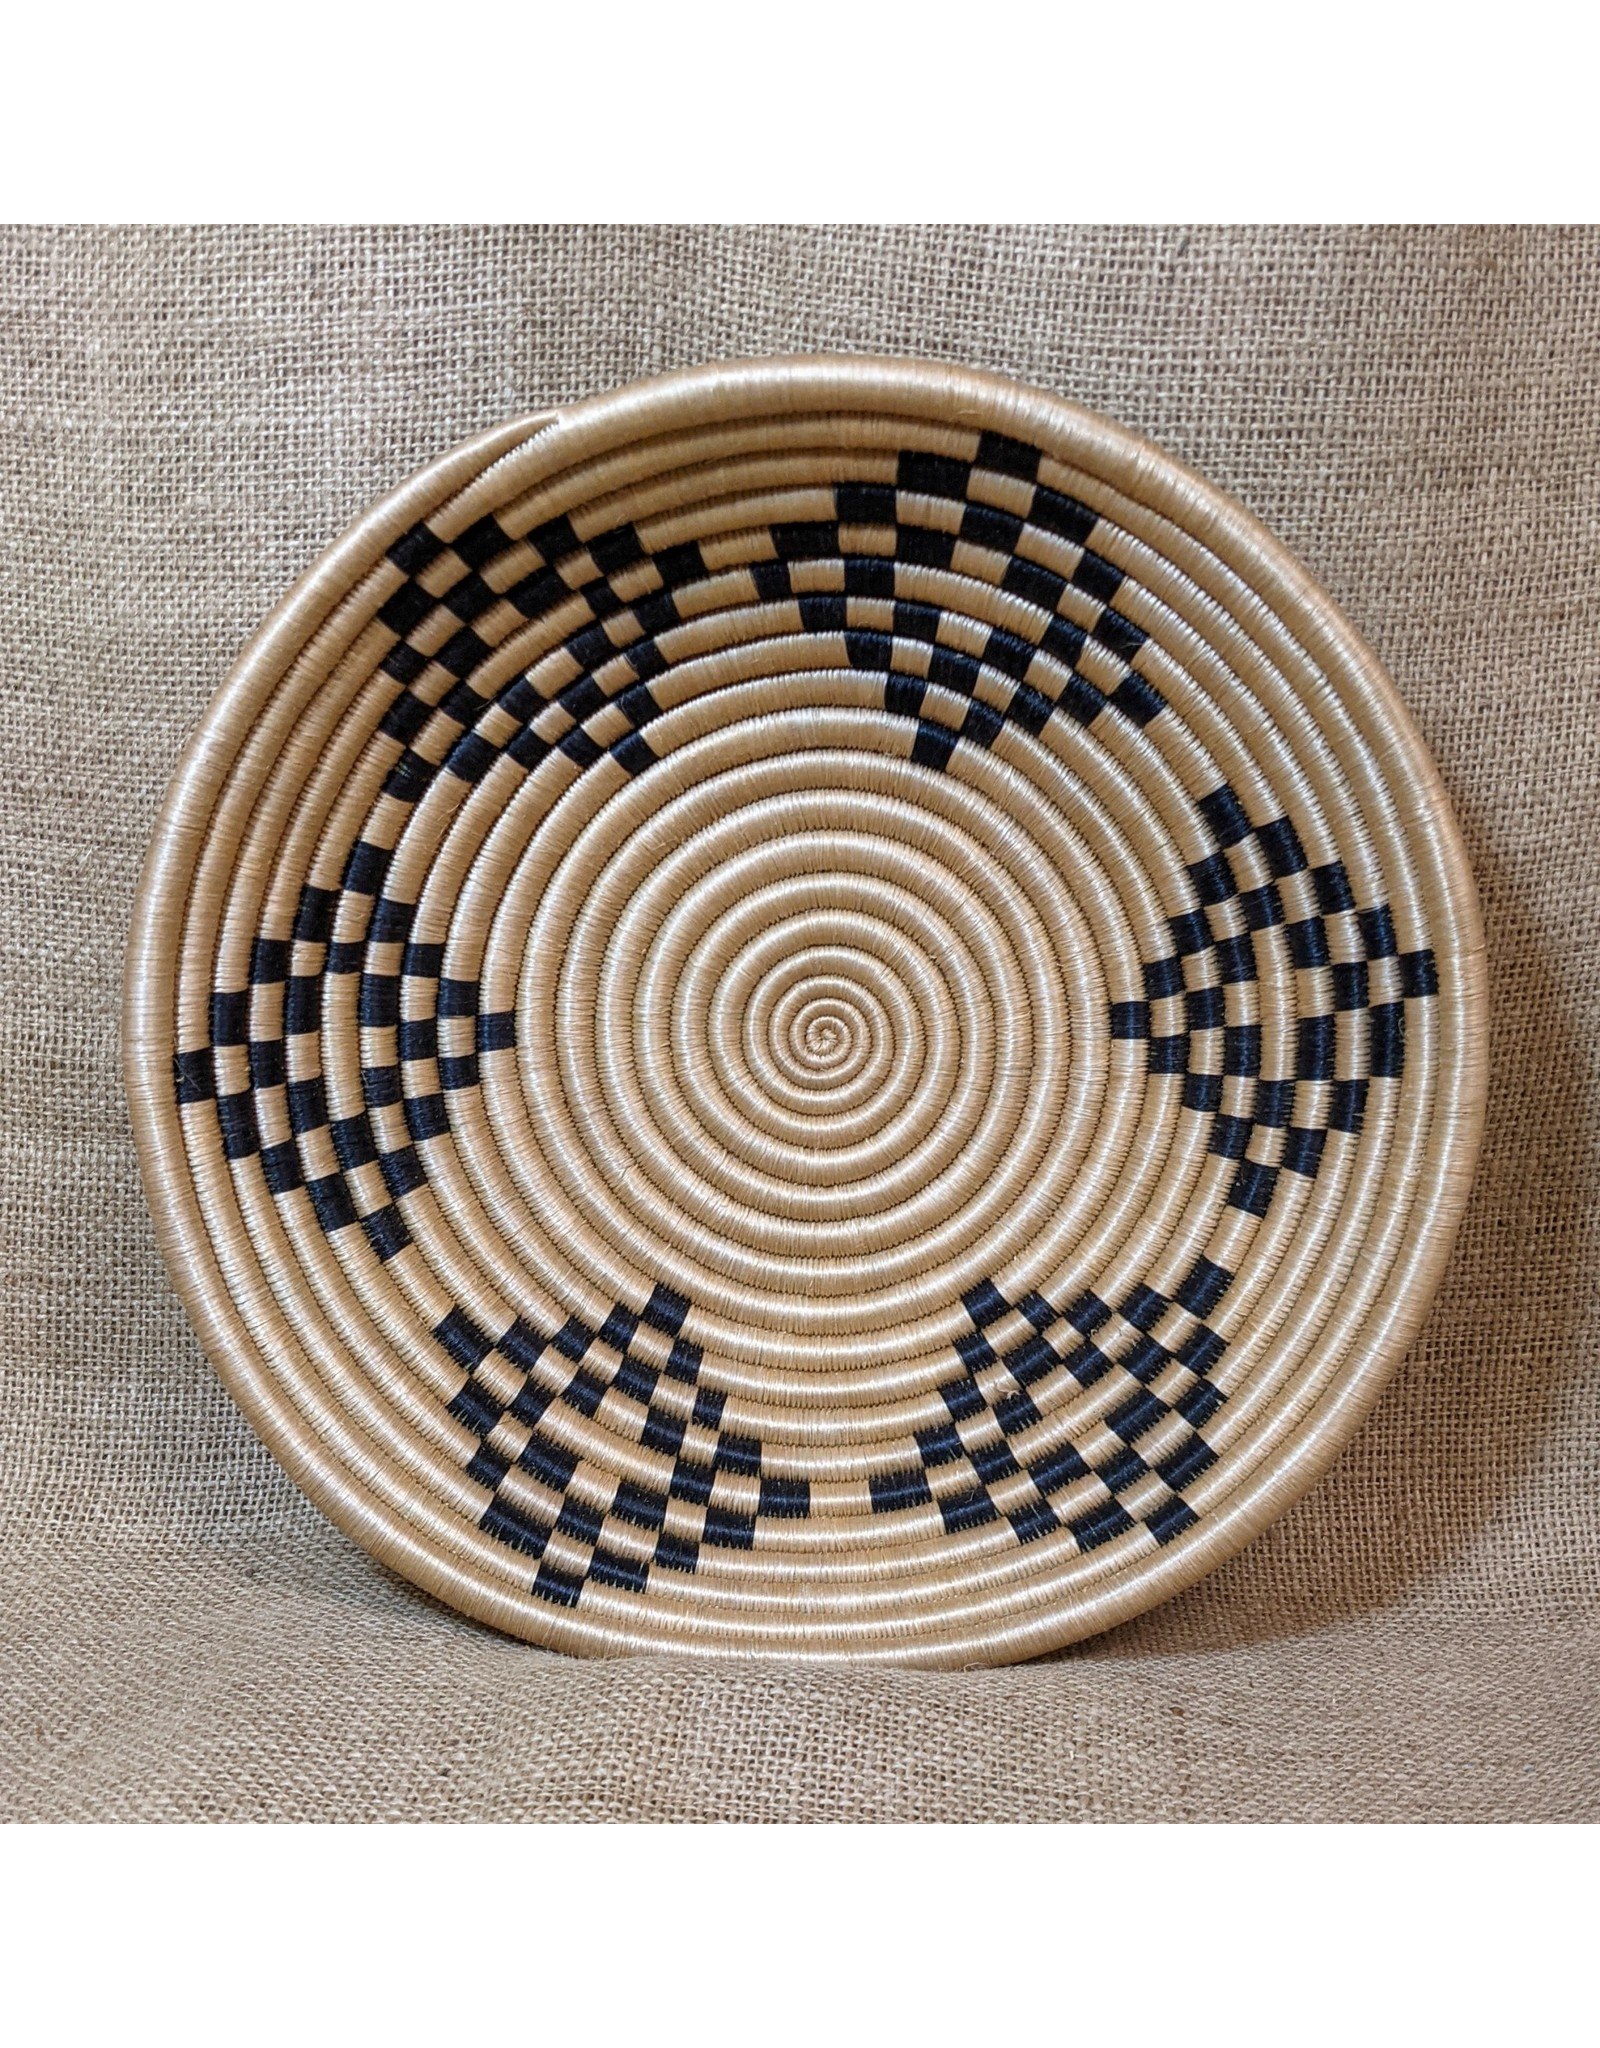 "Soko Home 12"" Bariku Woven Bowl, Tea, Rwanda"